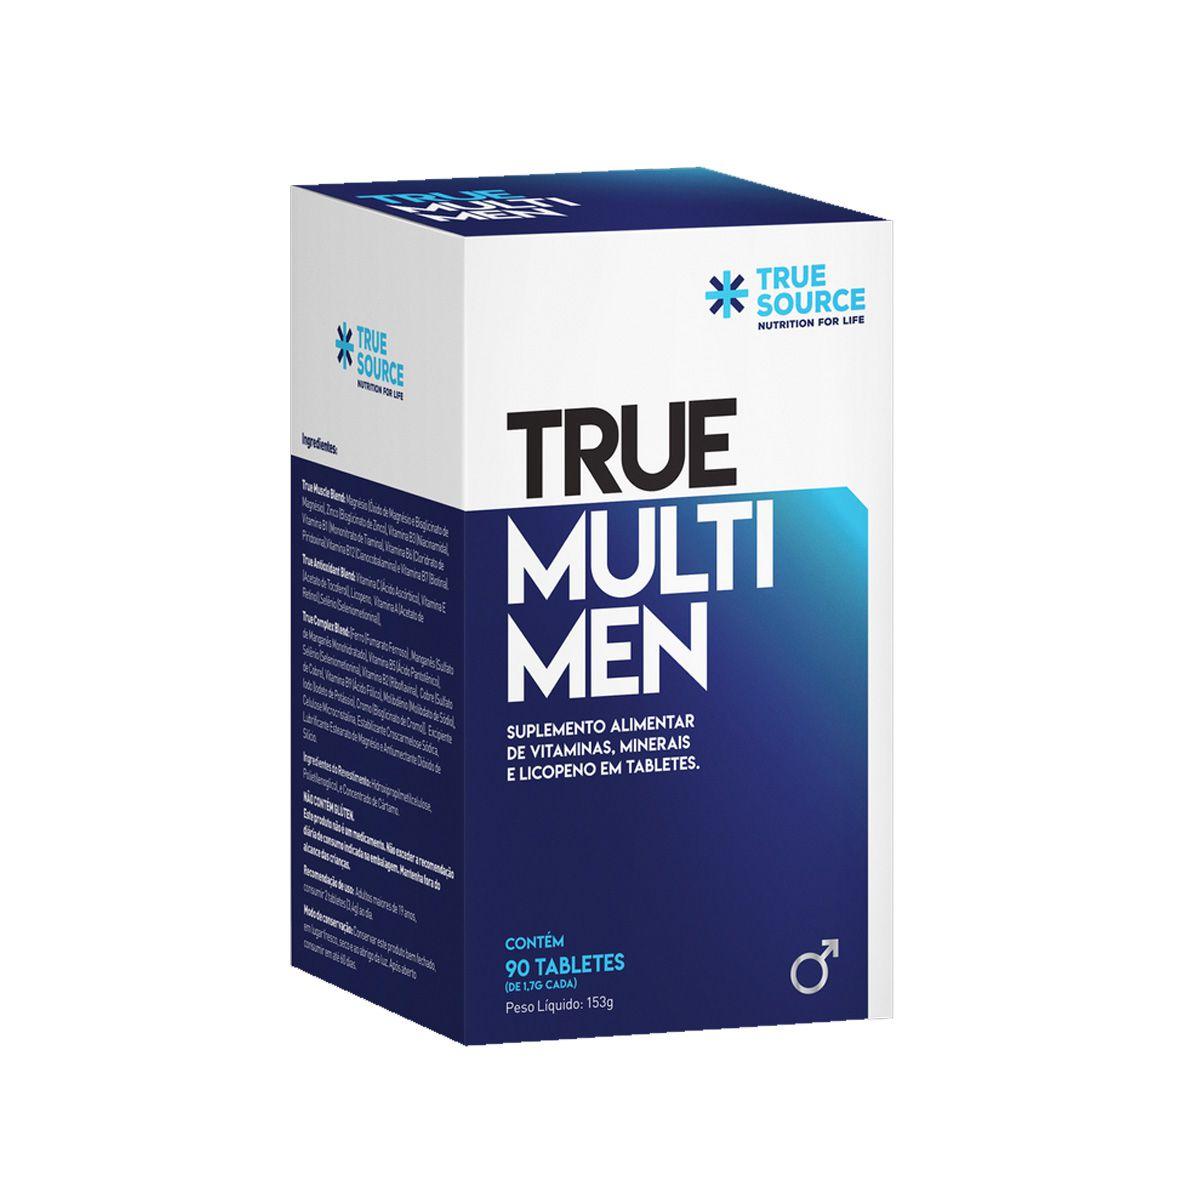 True Multimen - 90 Tabletes - True Source